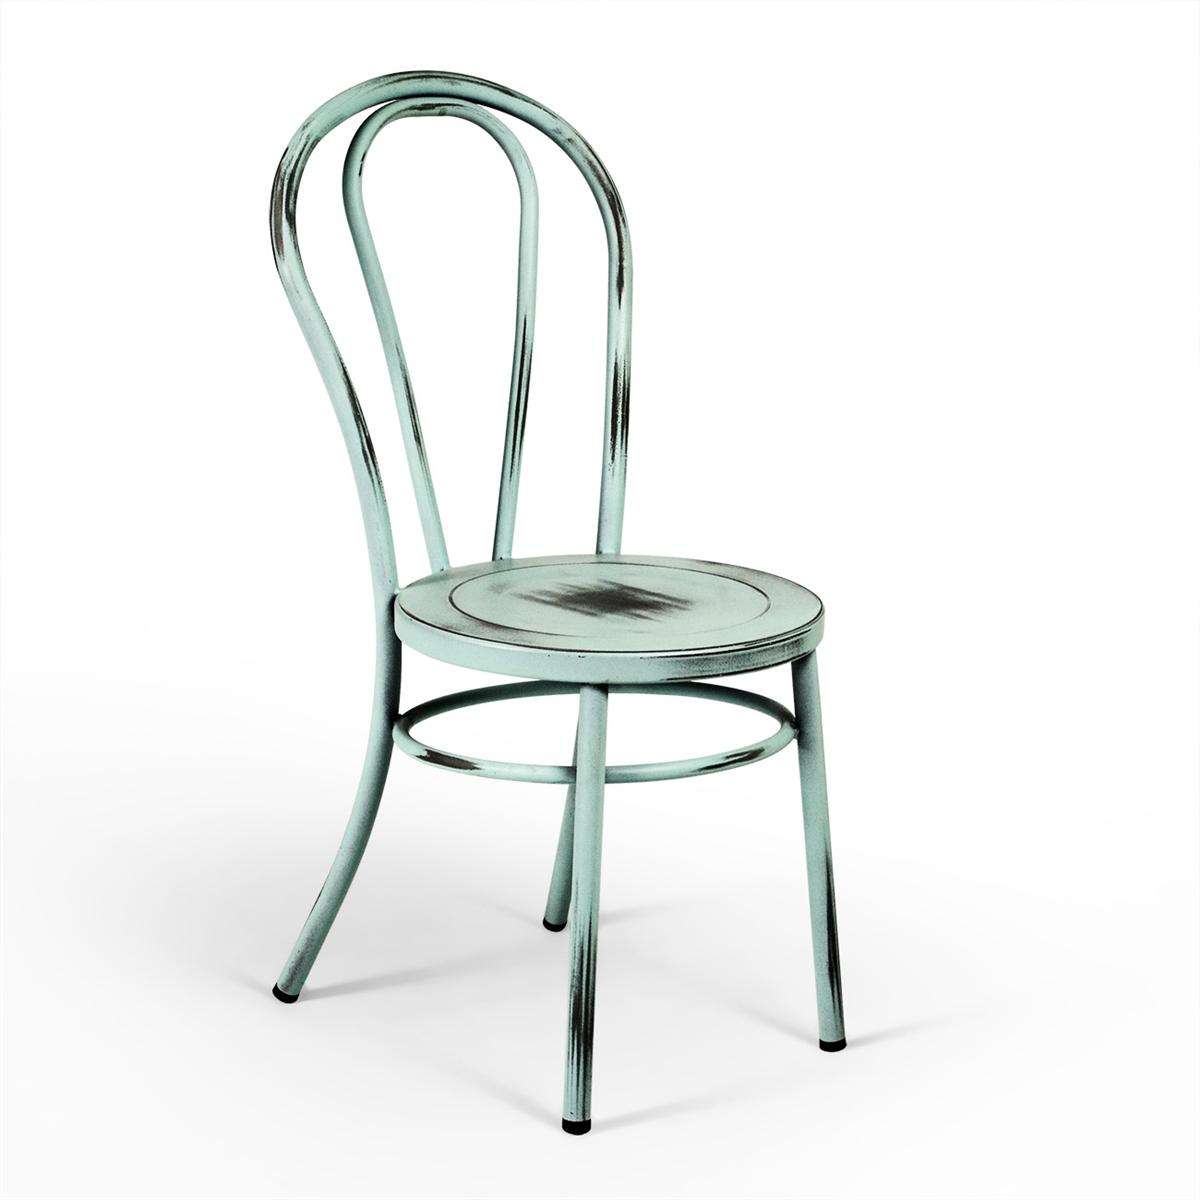 distressed metal furniture. Alternative Views: Distressed Metal Furniture D